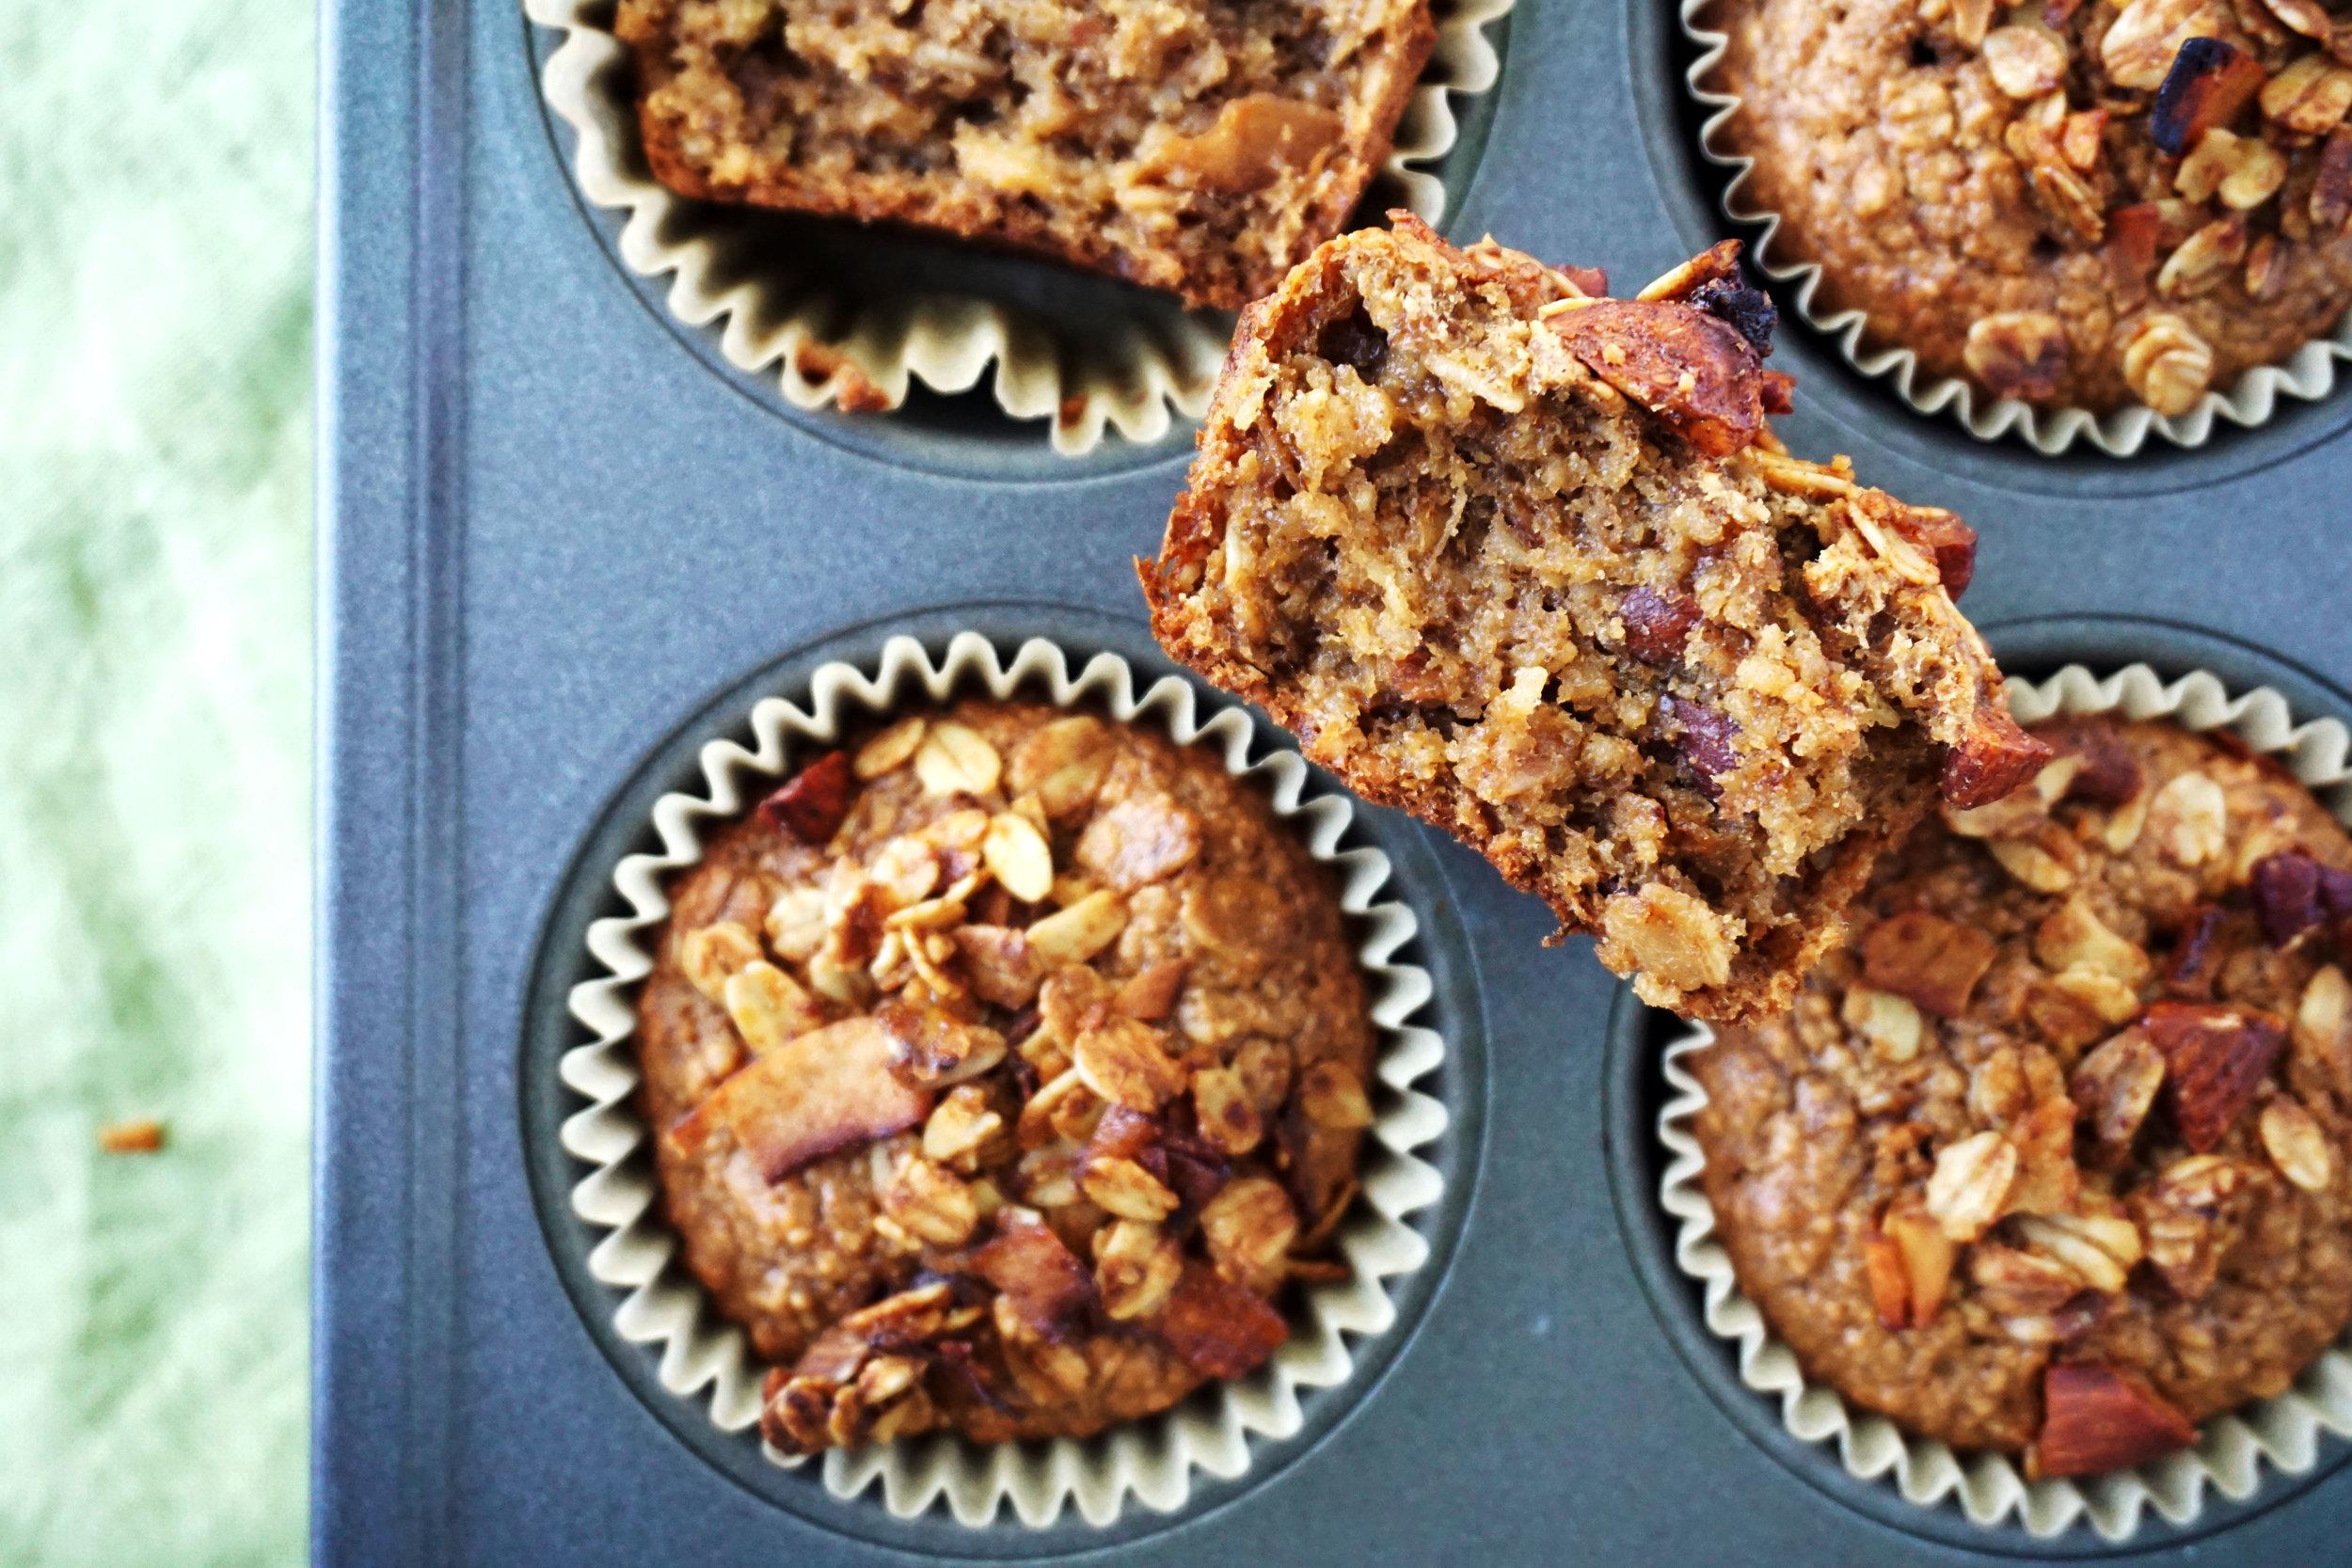 Cinnamon Tahini and Toasted Granola Muffins (Vegan, GF)